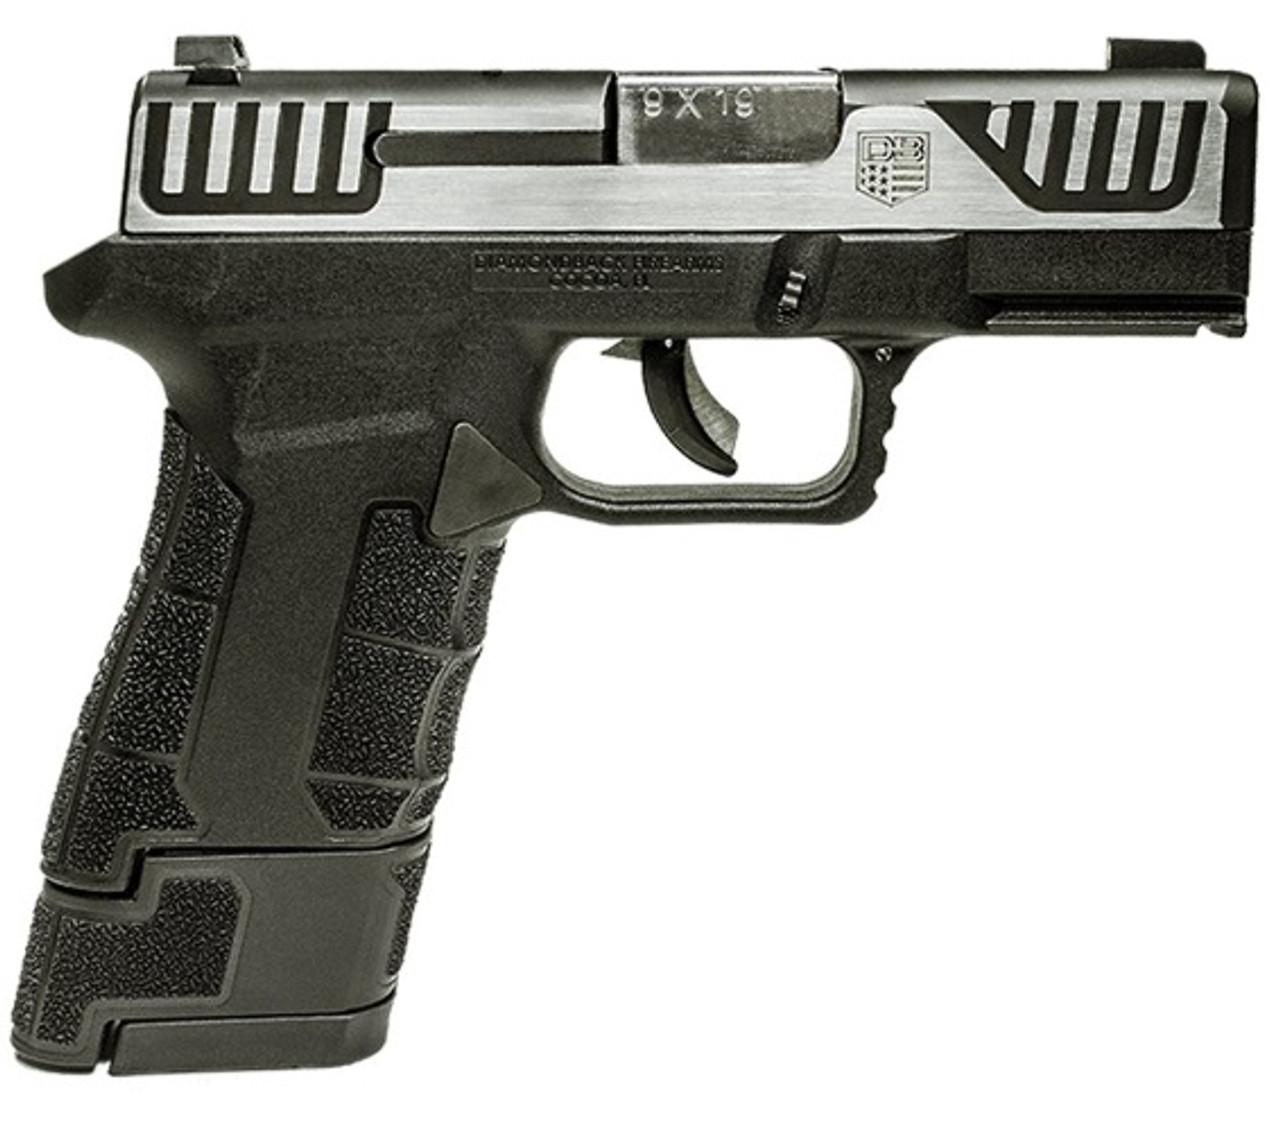 Diamondback Firearms Am2 9mm Ss Sub Cmpt 15+1 3.5